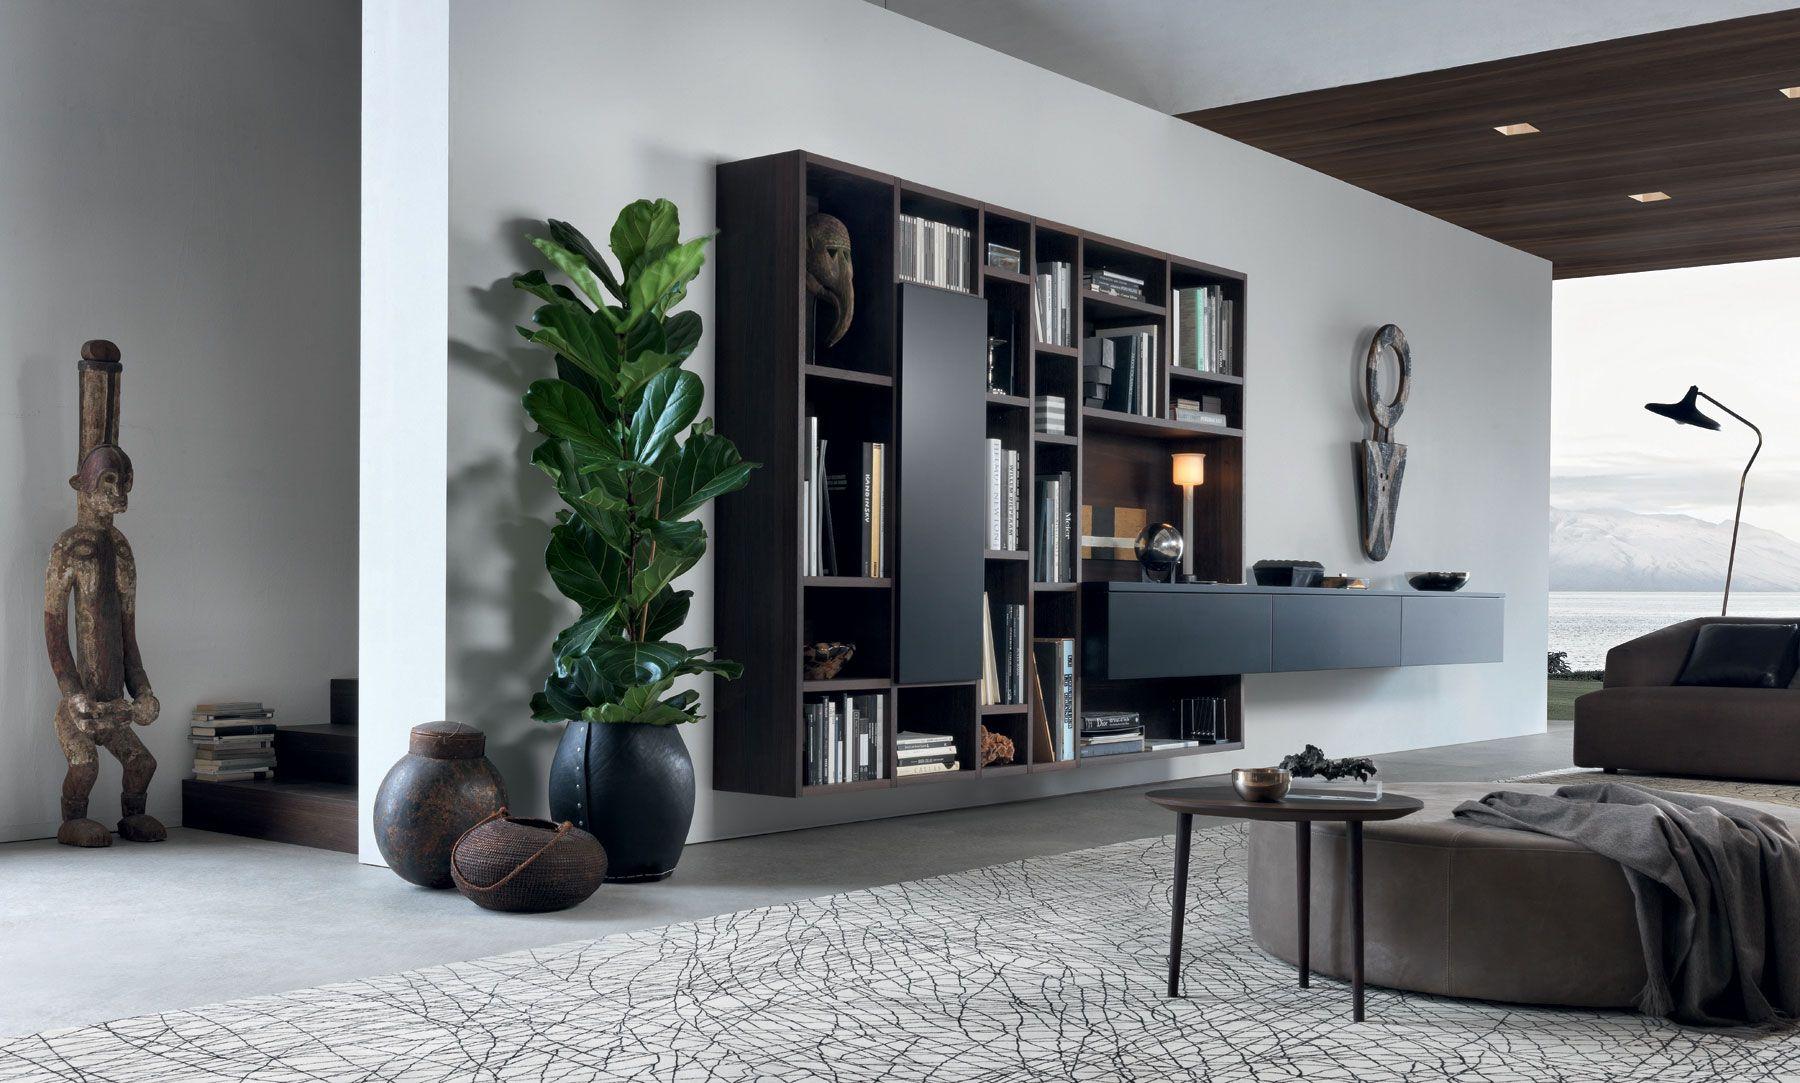 Jesse Mobili Arredamento Design Wall Units open